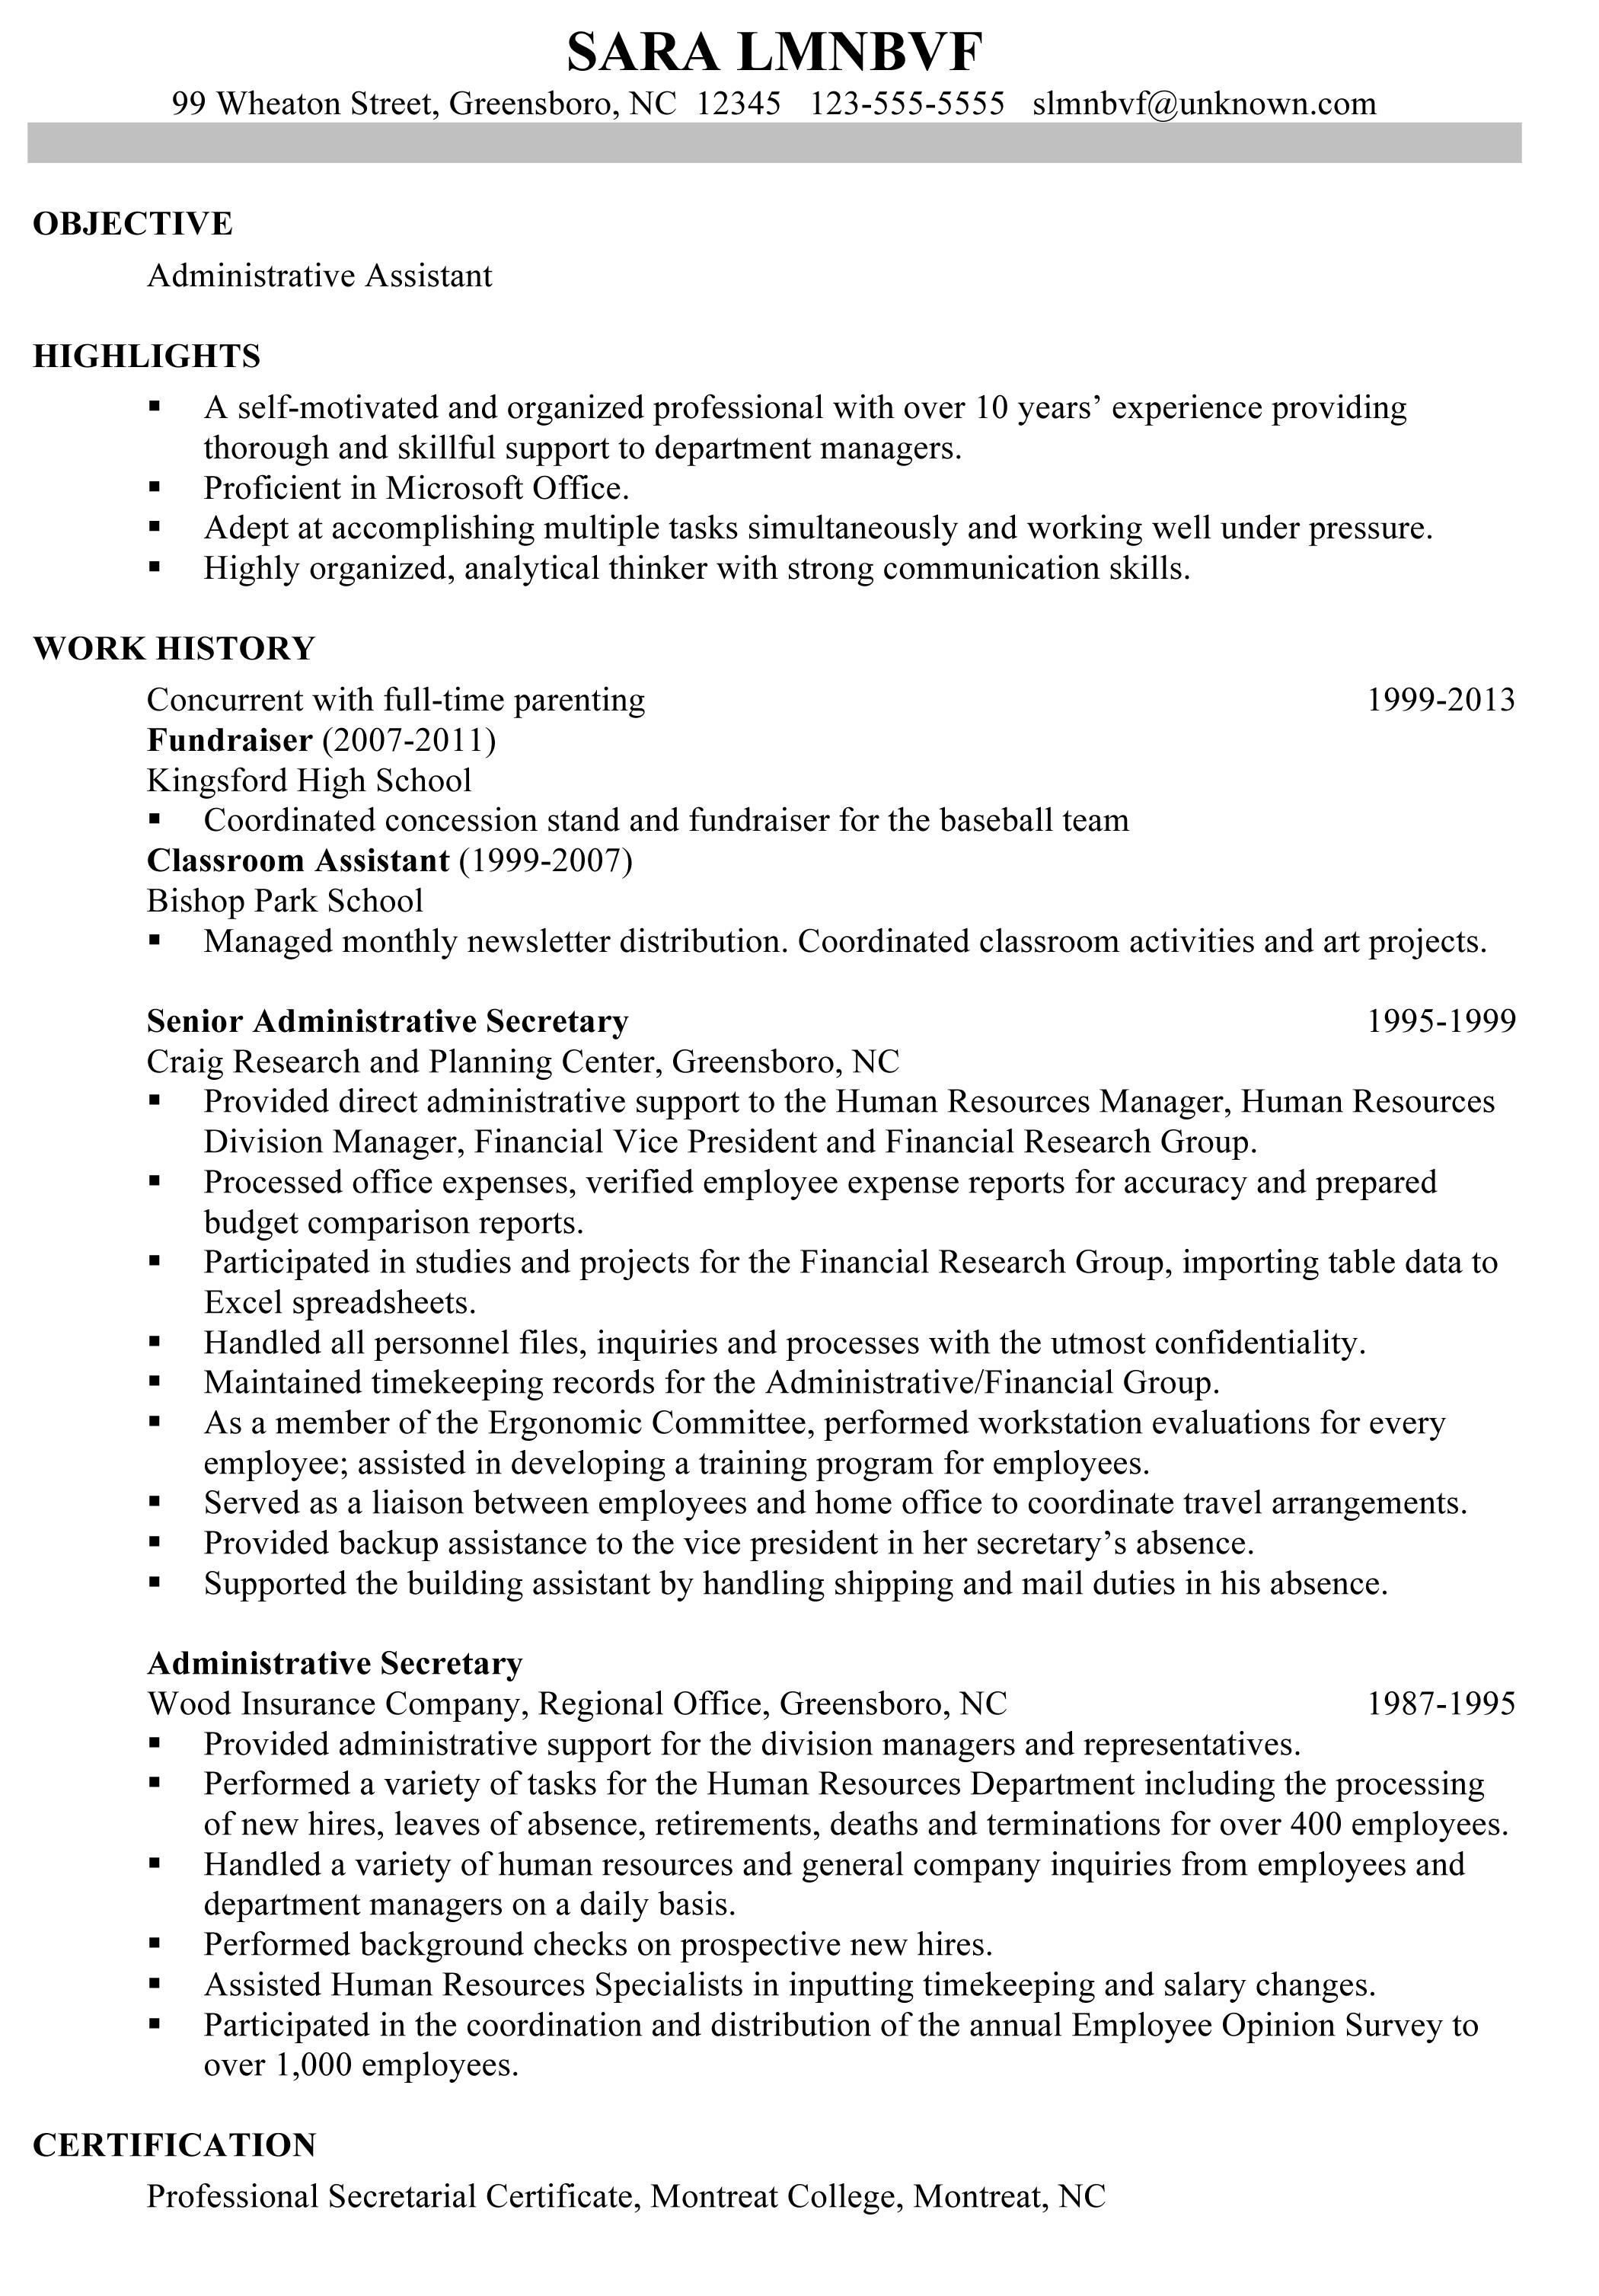 ready resume pdf